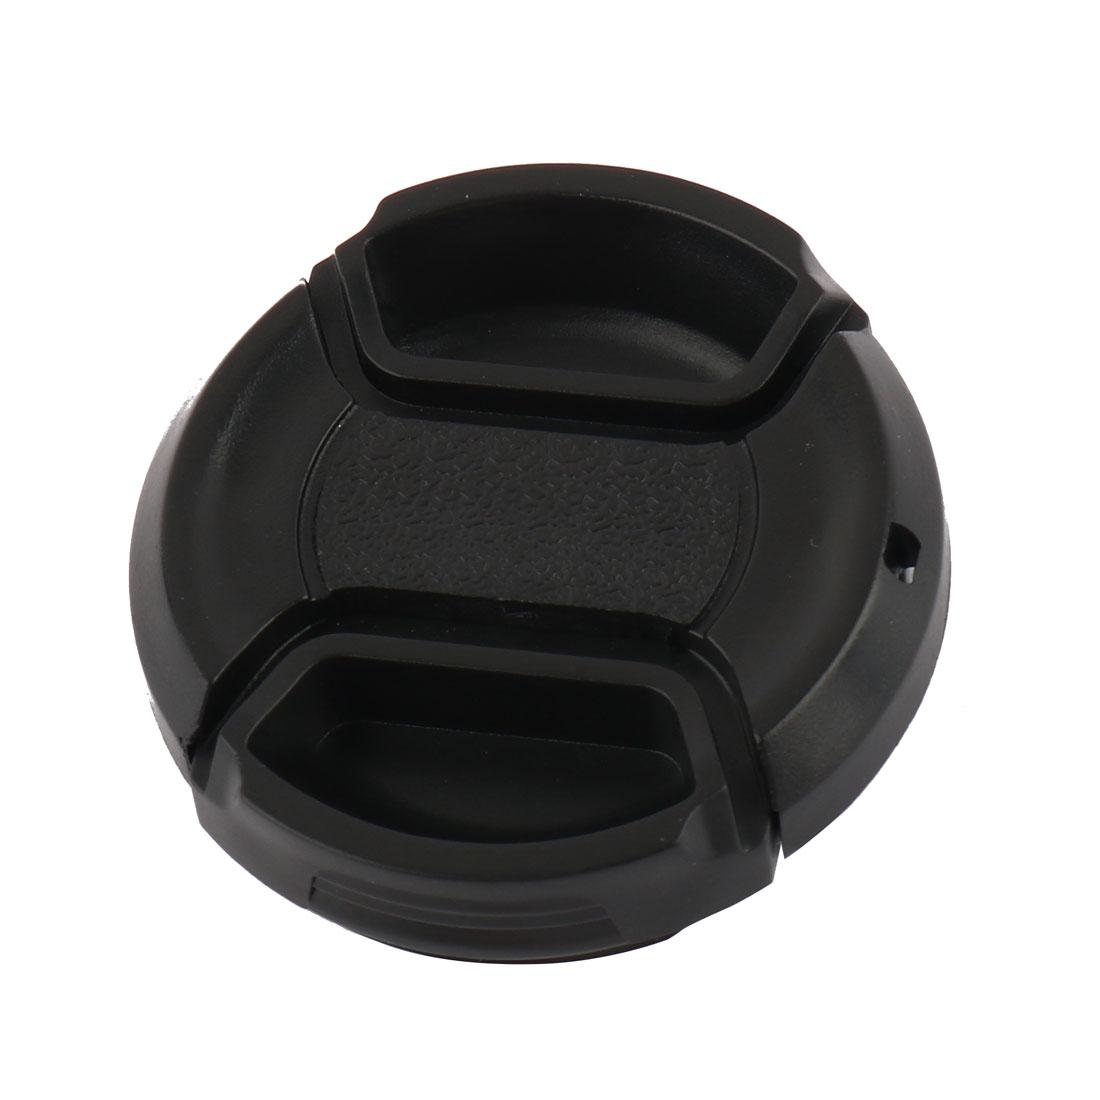 Univeral 37mm Dia.Center Pinch Front Lens Cap for DSLR Camera